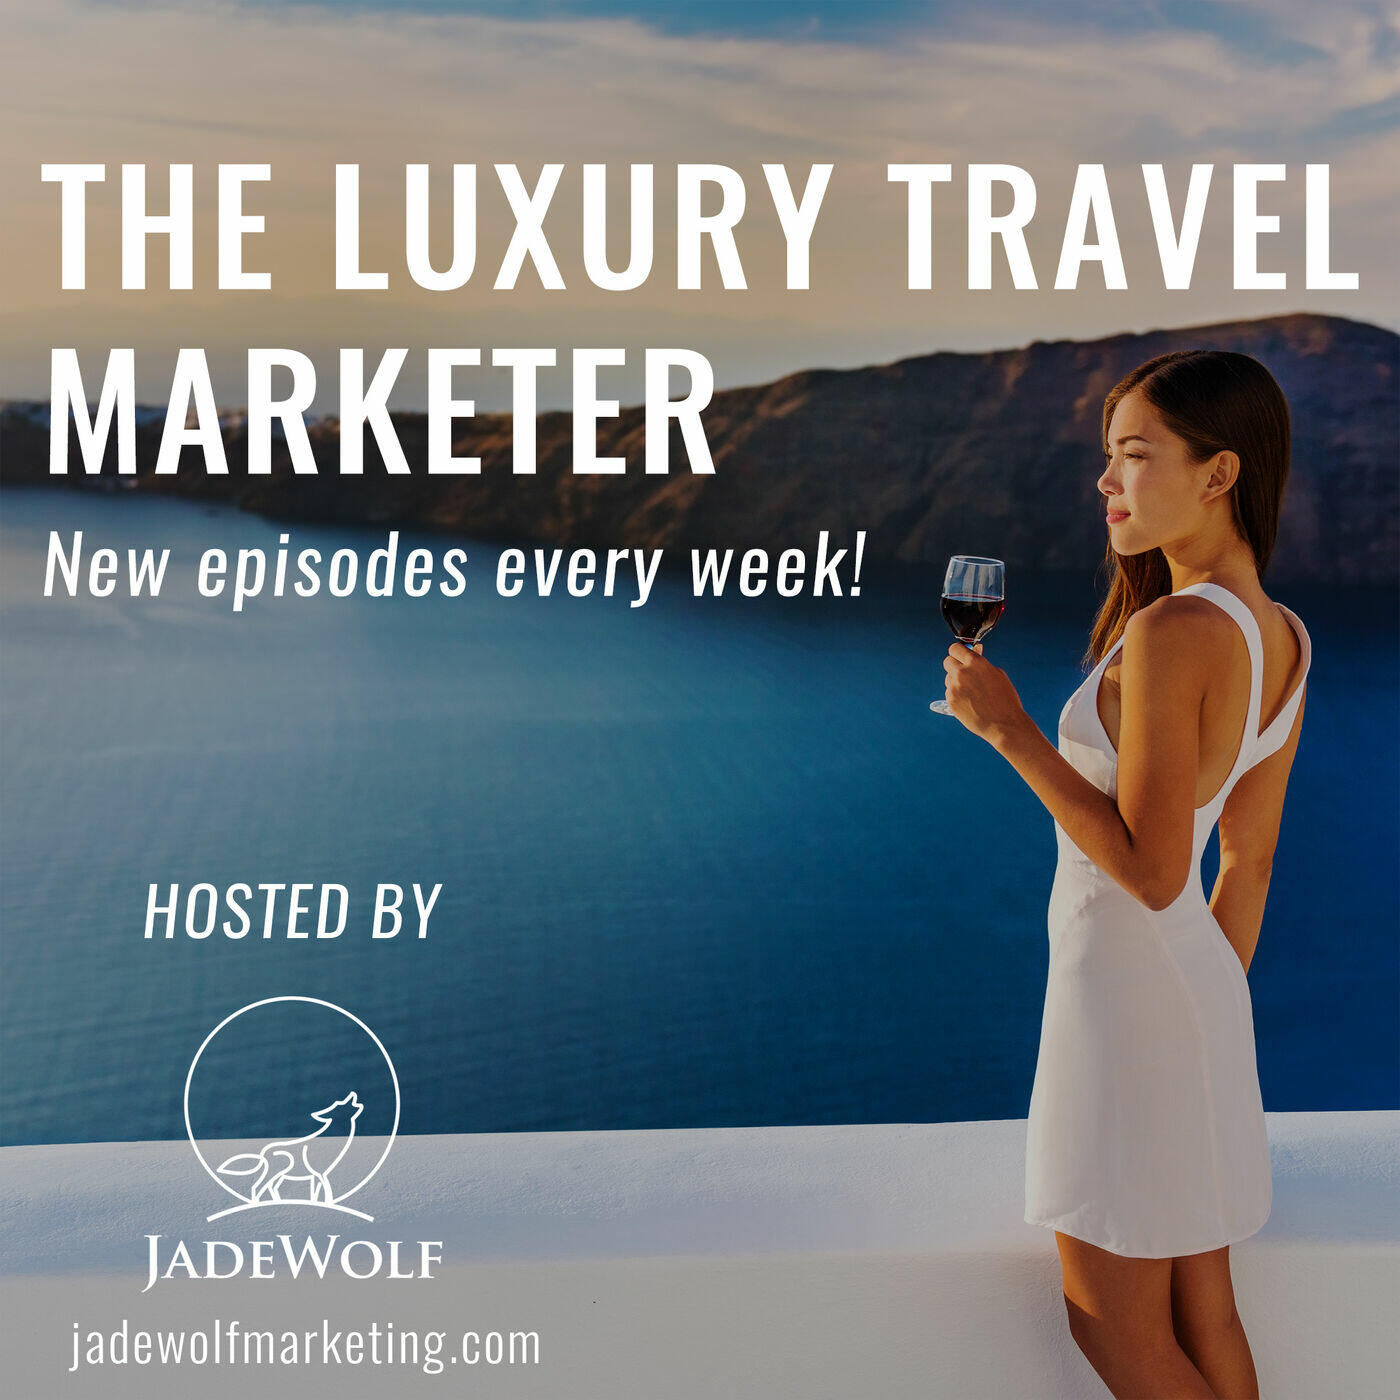 The Luxury Travel Marketer